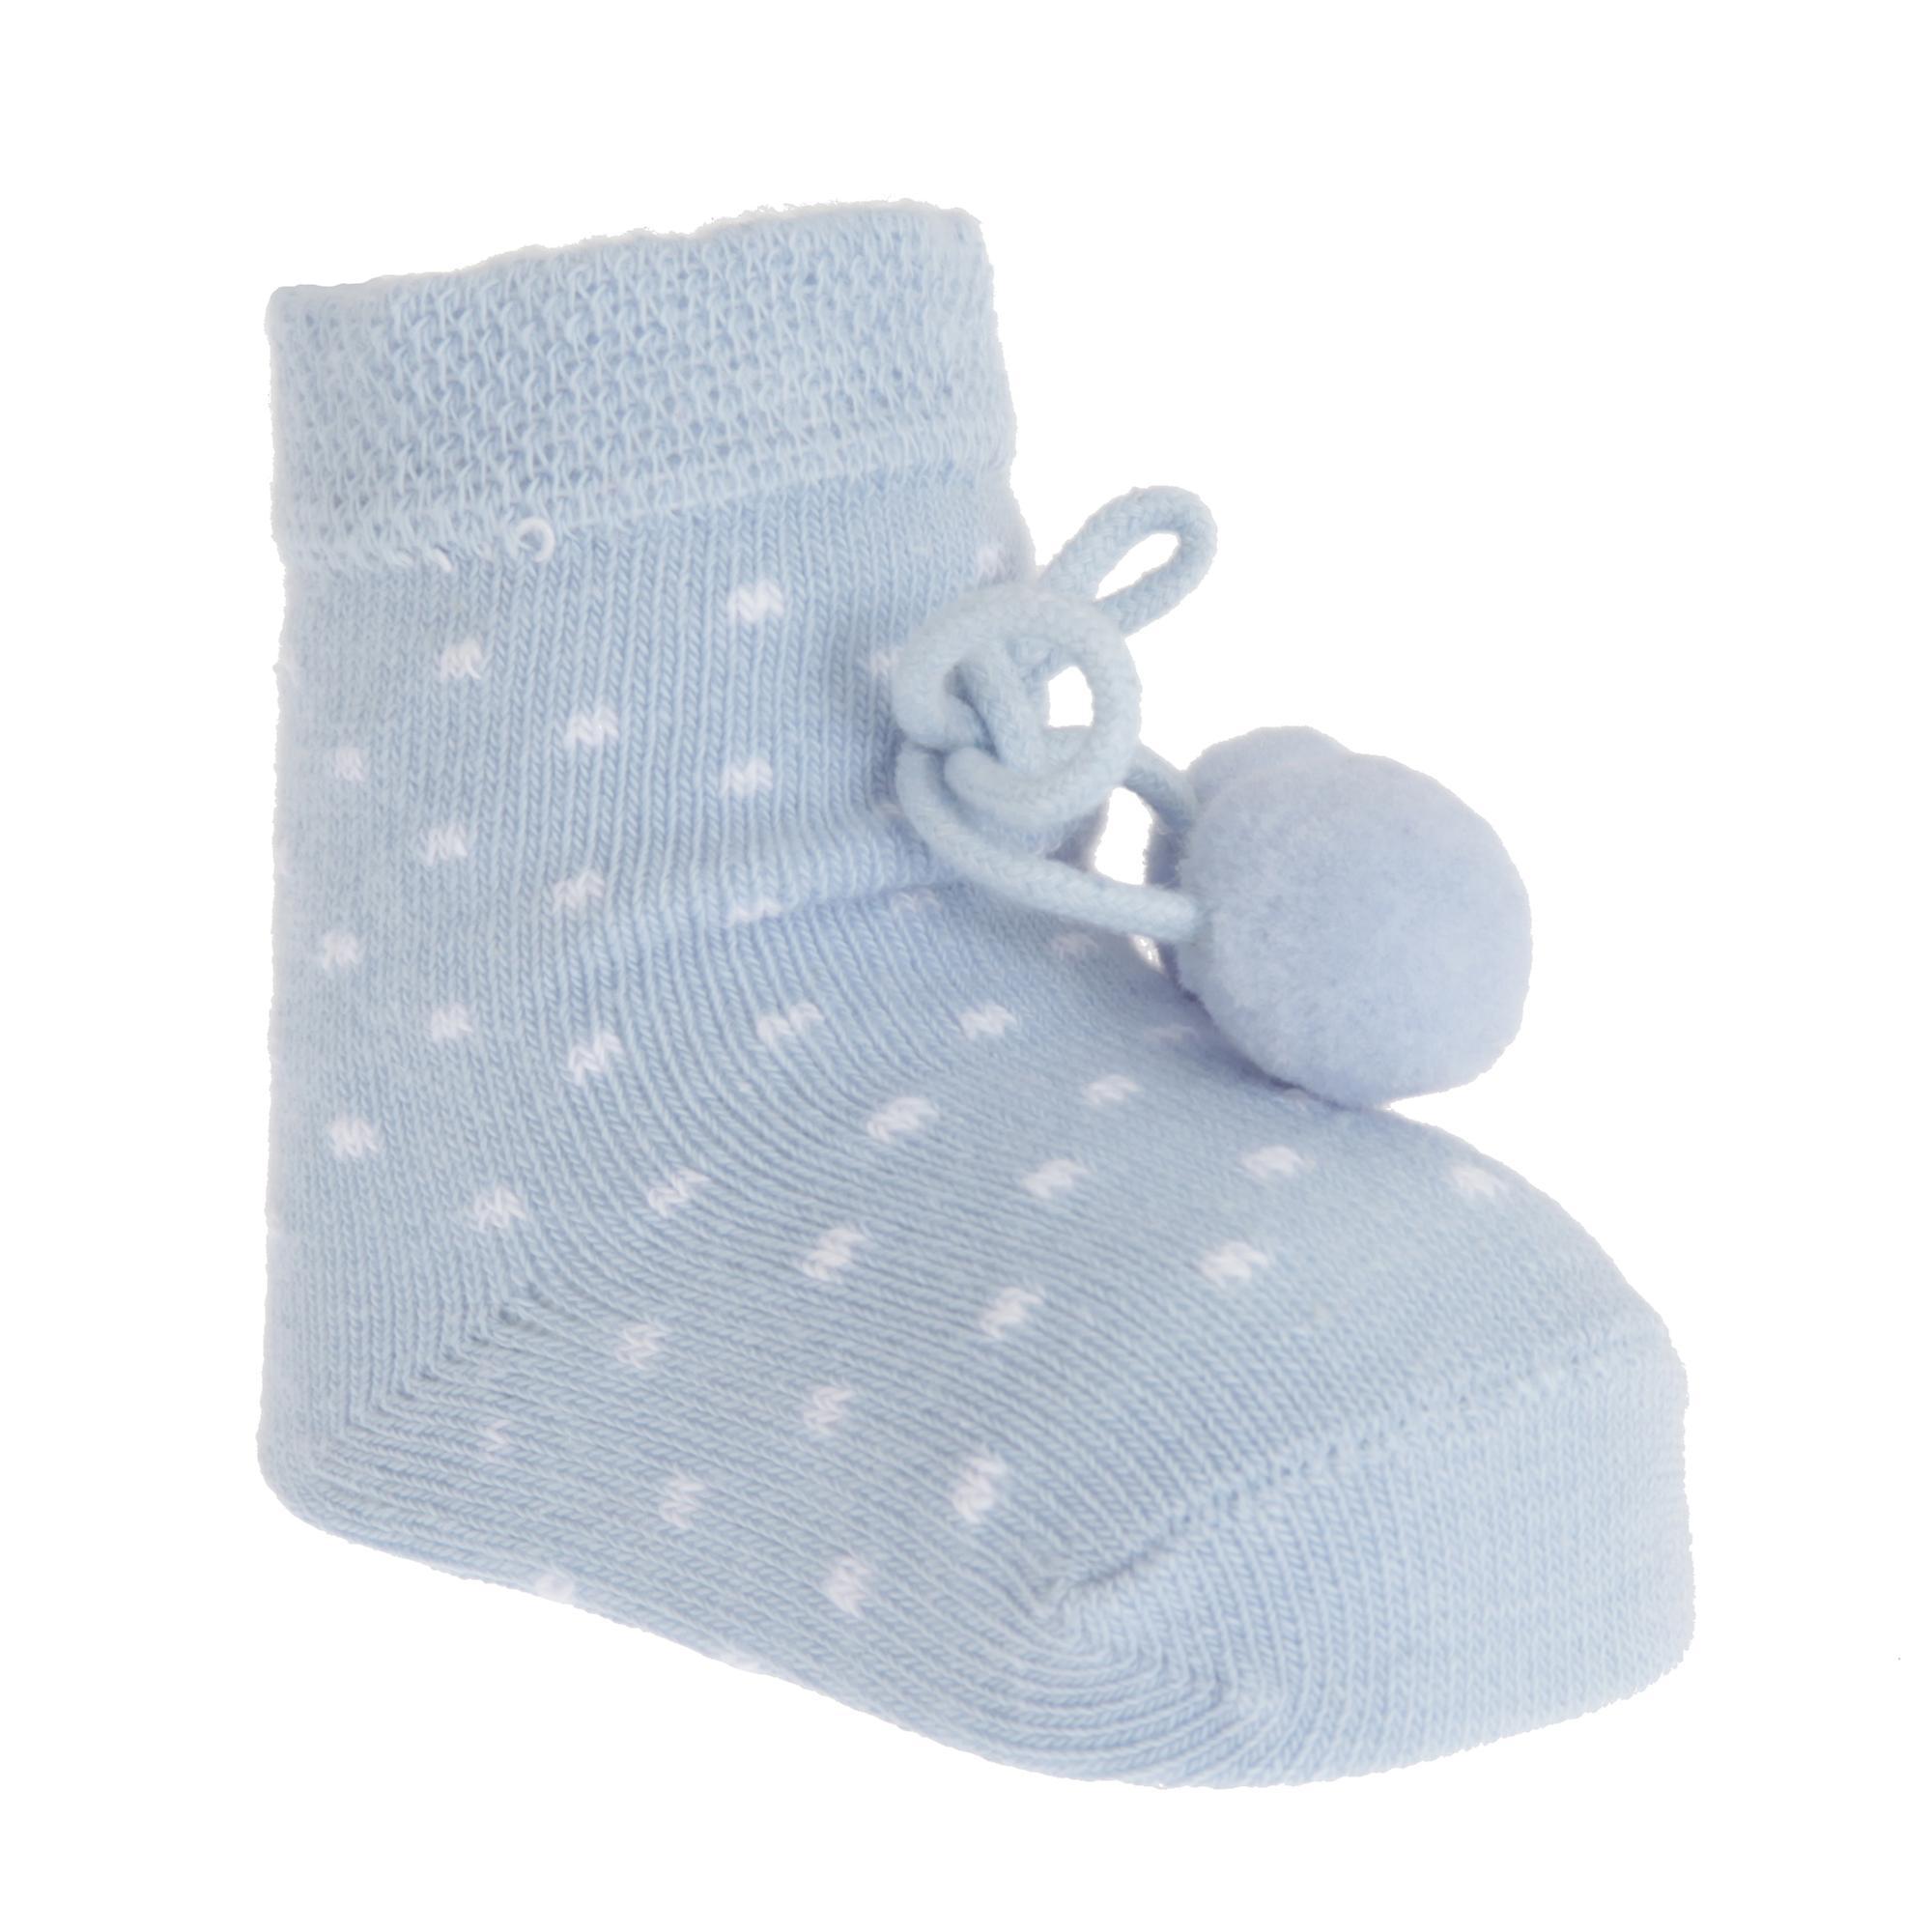 My Little Chick Newborn Baby Boys Socks With Pom Poms